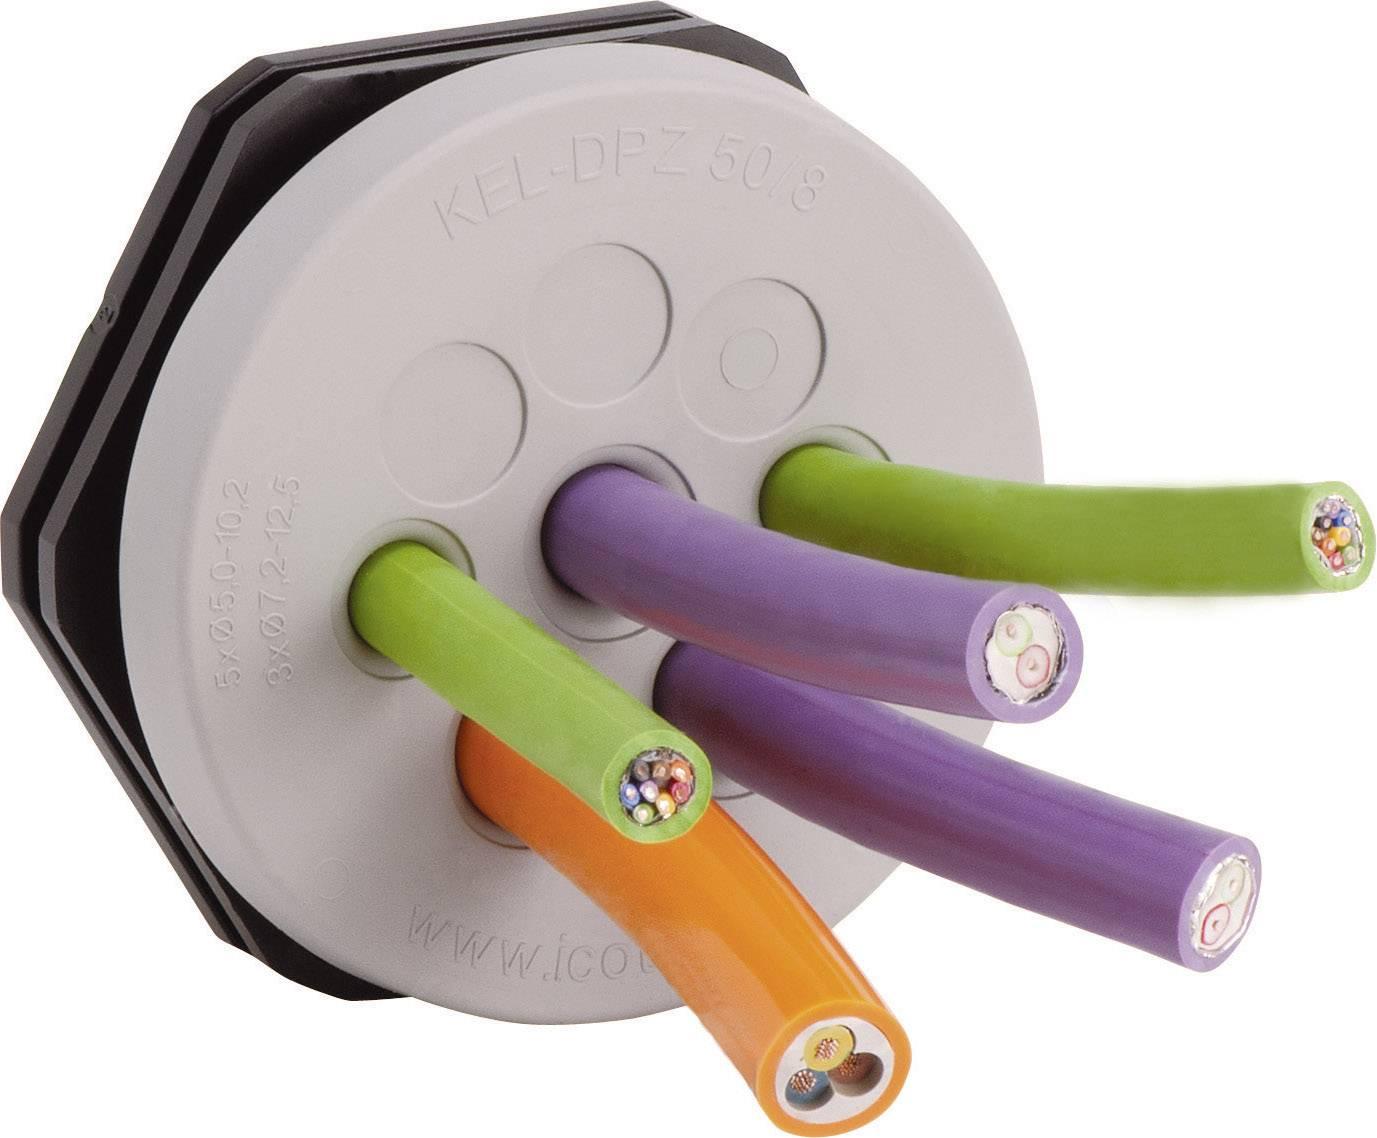 Icotek Uvodnica za kable KEL-DPZ okrogla KEL-DPZ 32|4 velikost: M32 poliamid/elastomer, siva